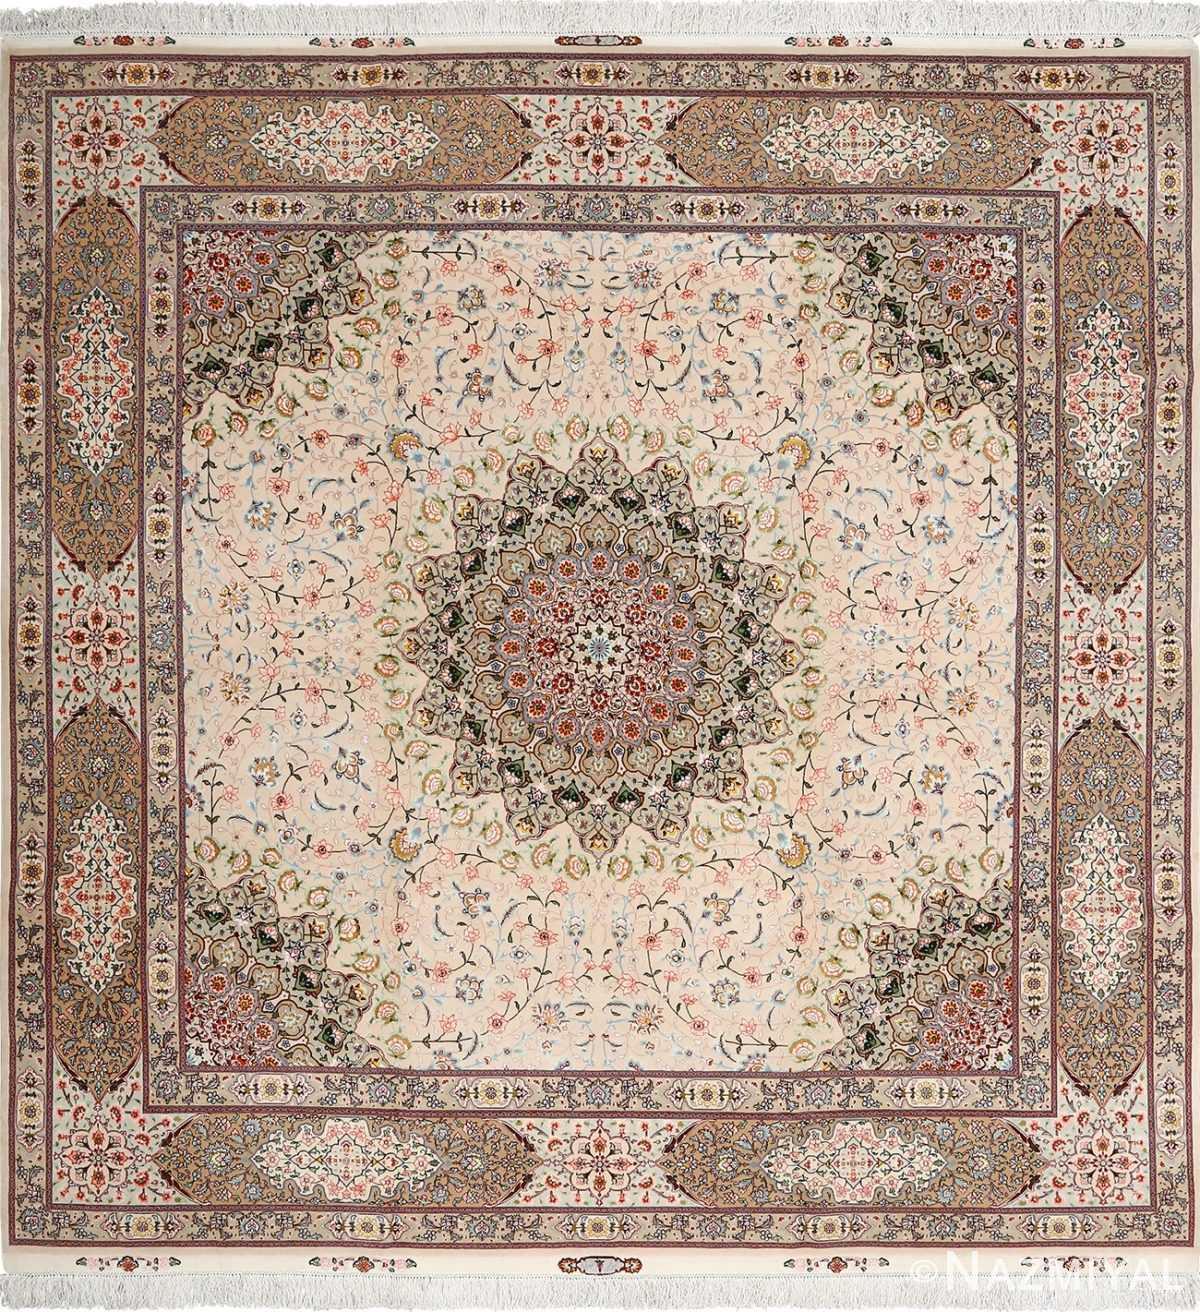 Modern Persian Tabriz Design Rug 44687 Nazmiyal Antique Rugs: Elaborate Square Vintage Tabriz Persian Rug 51076 By Nazmiyal